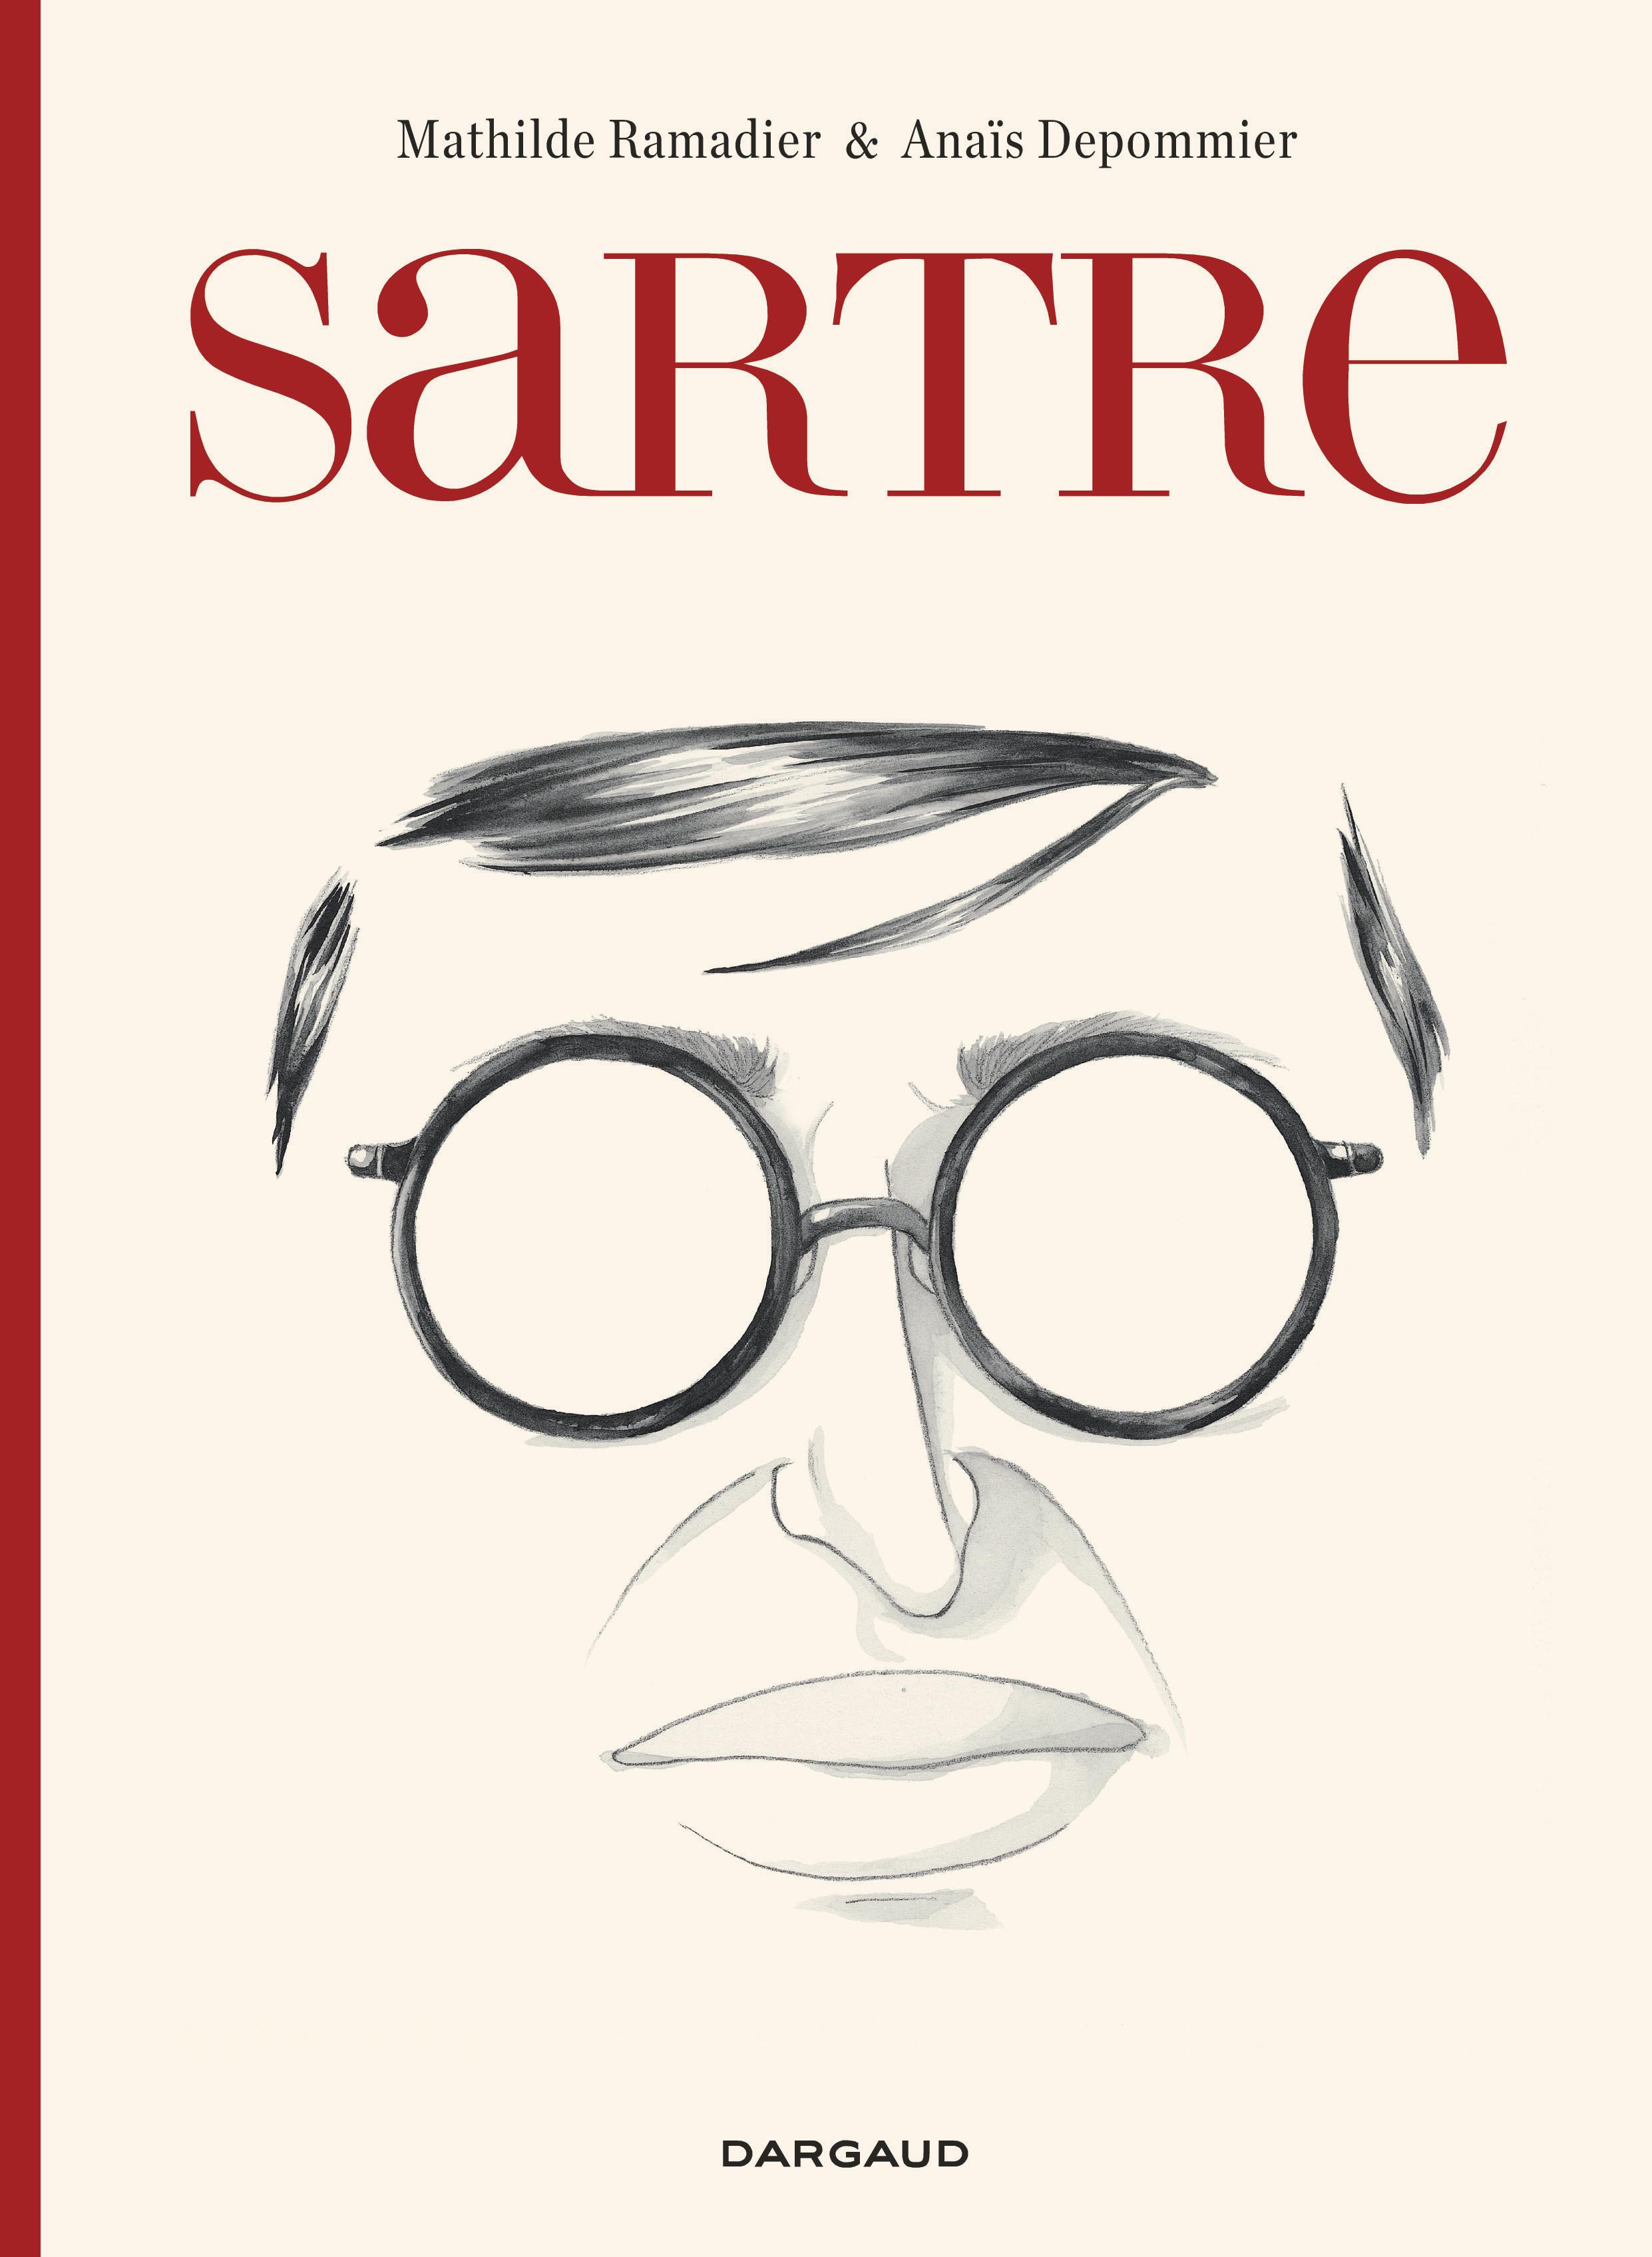 Sartre, intransigeant philosophe